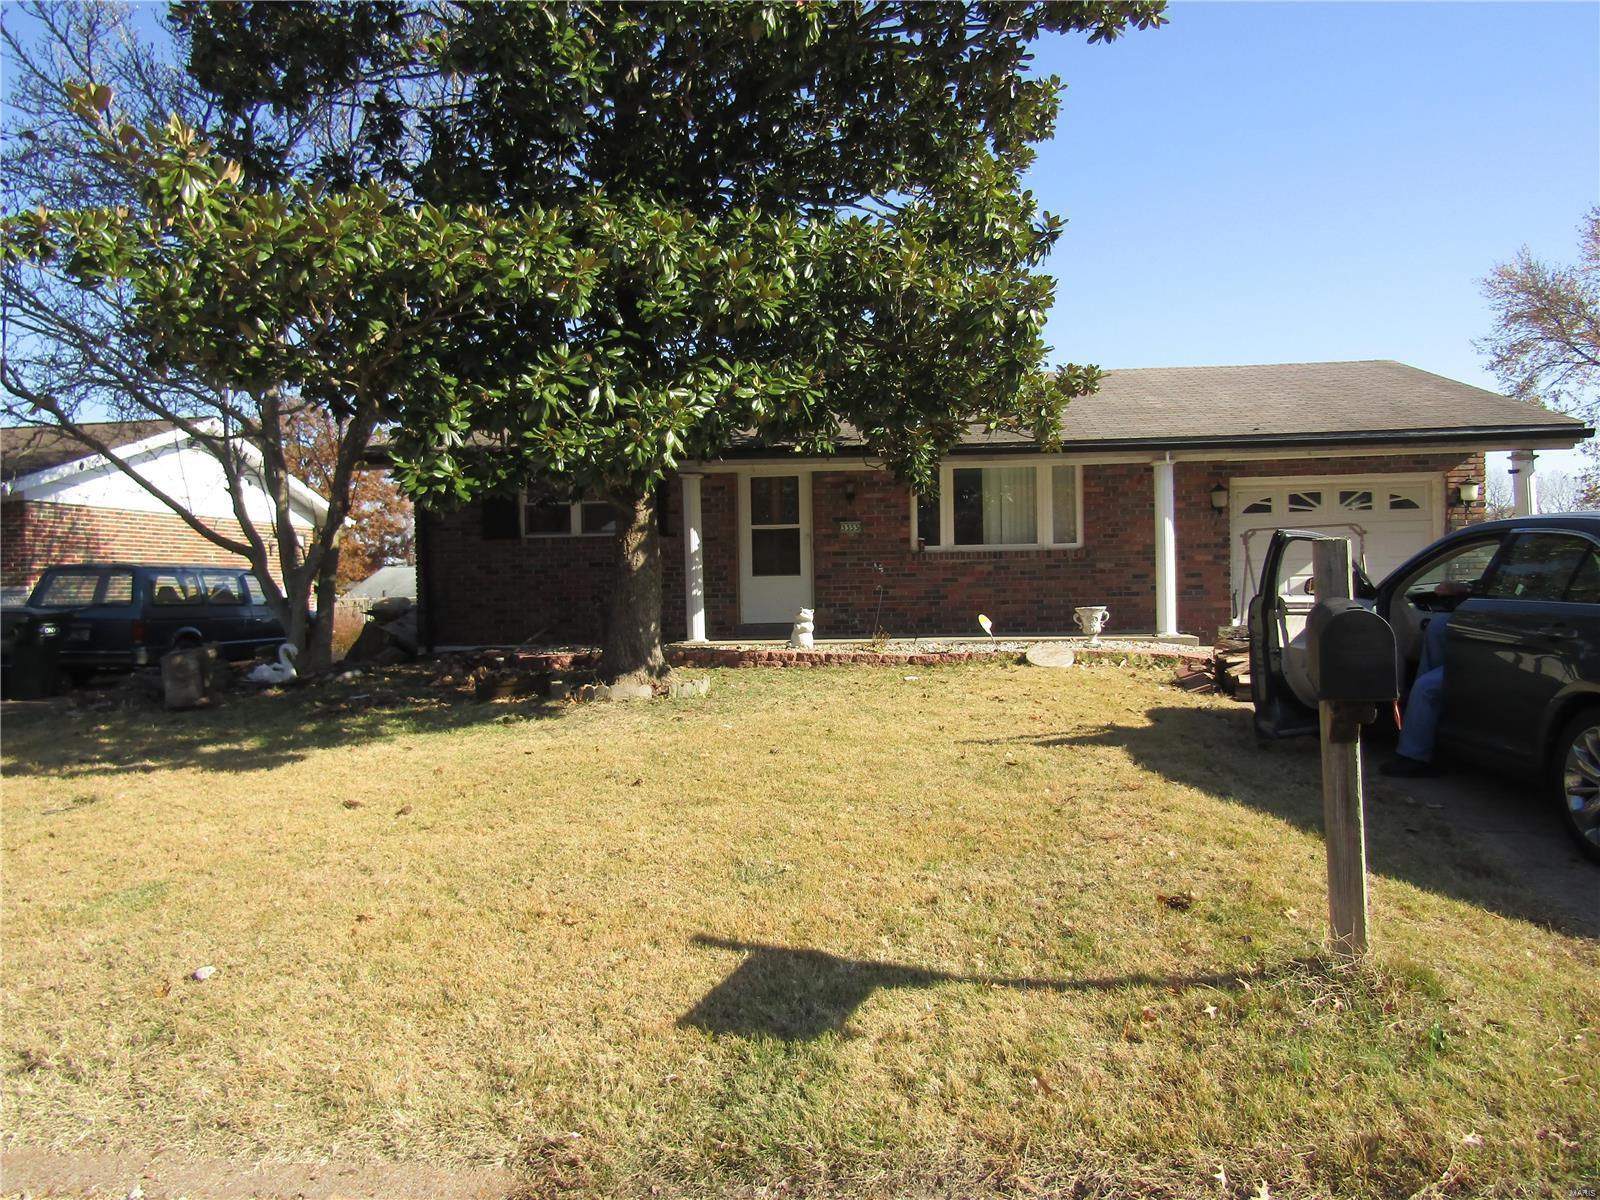 3355 Boca Raton Property Photo - Arnold, MO real estate listing